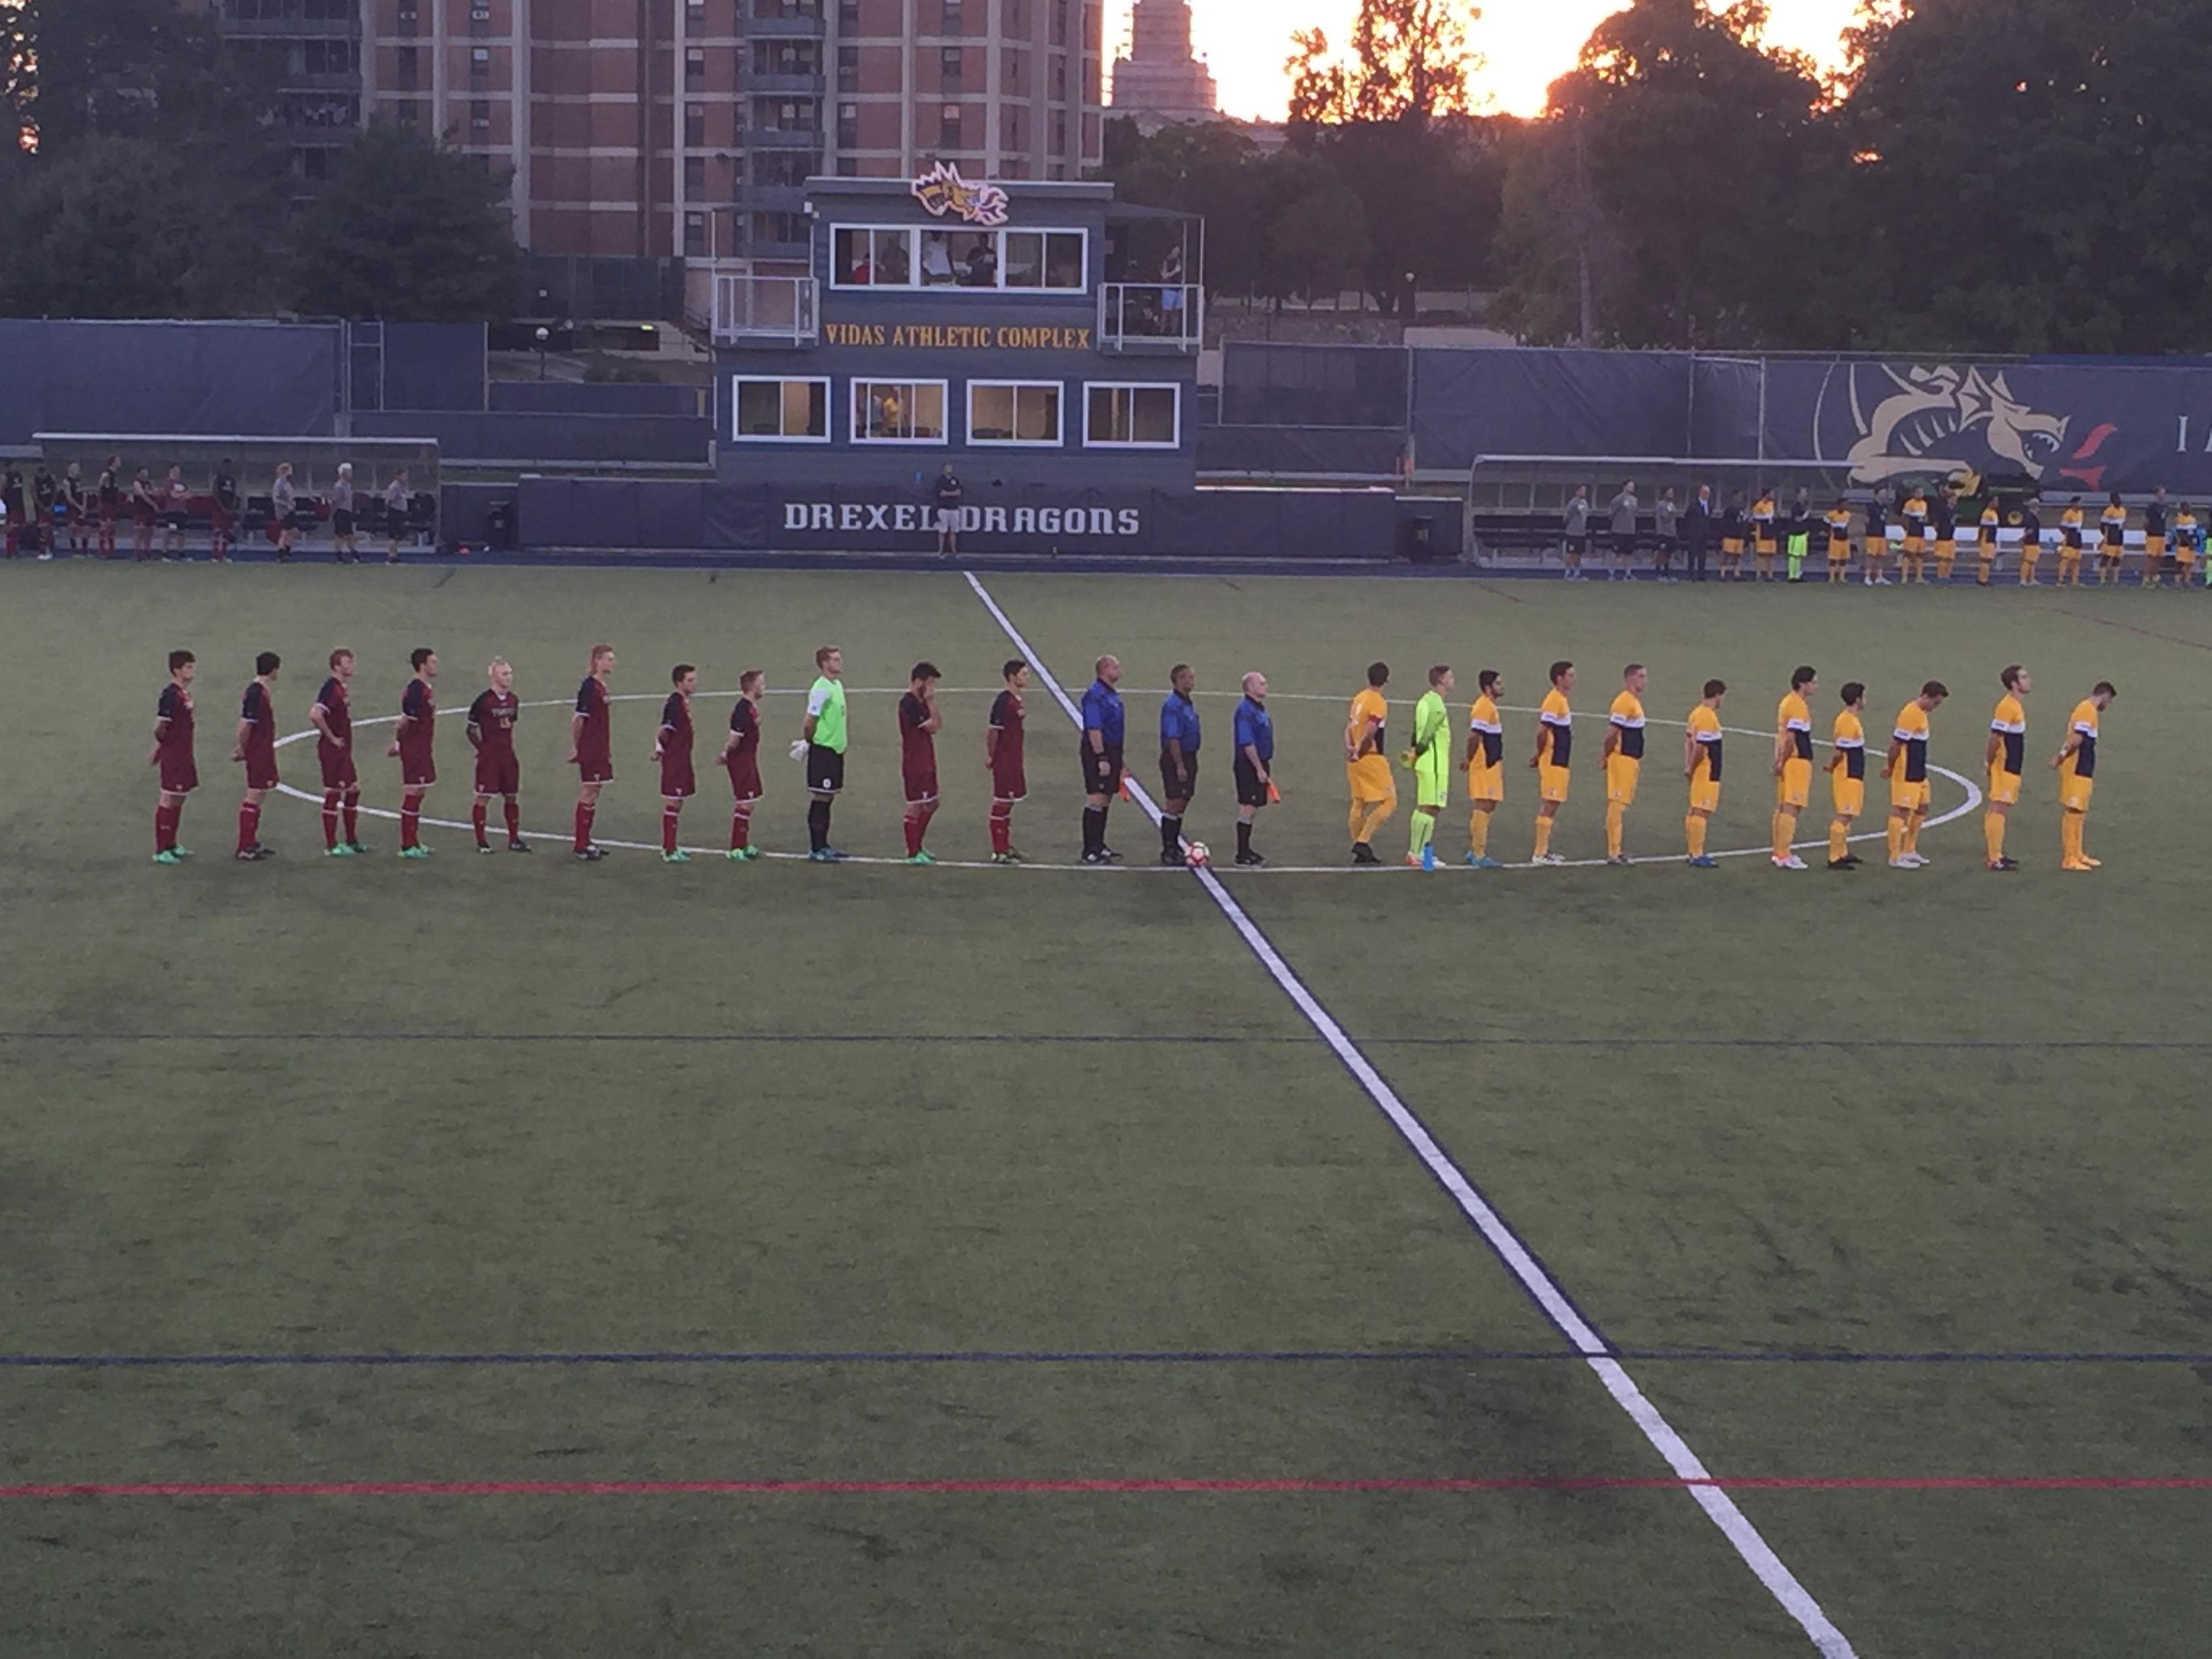 Temple Men's Soccer loses to Drexel in overtime.